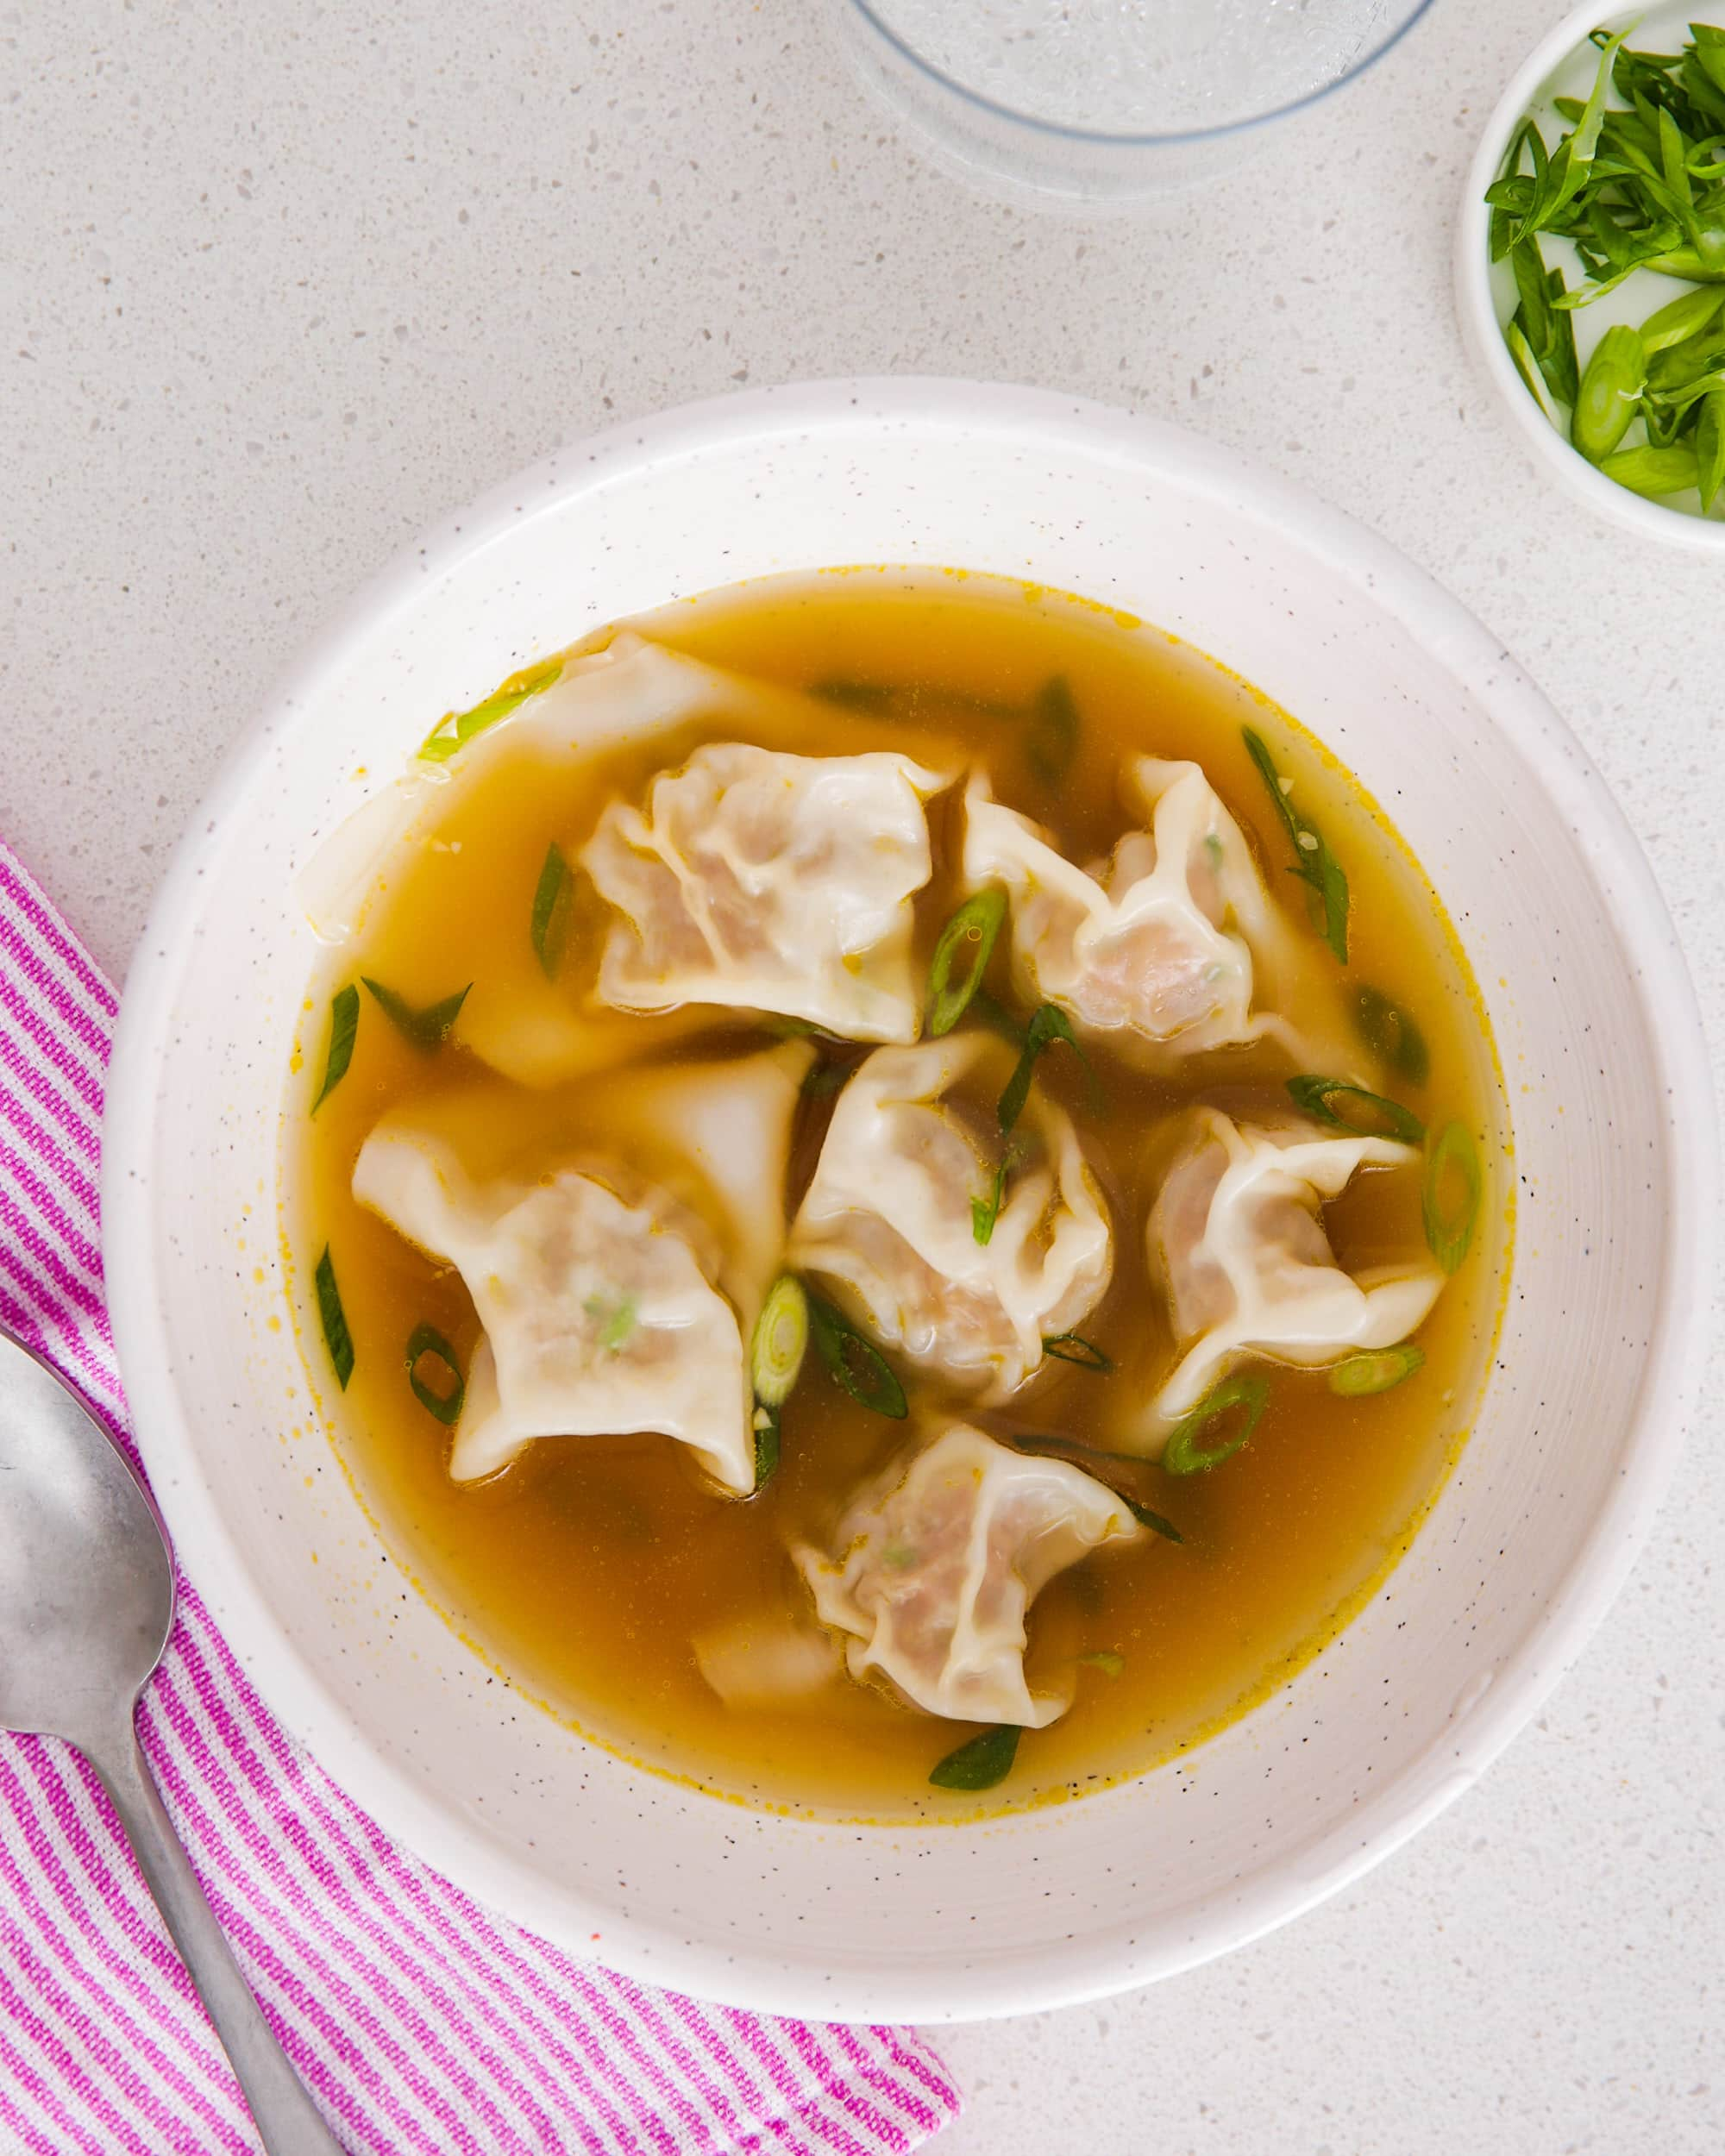 Recipe: Easy Wonton Soup